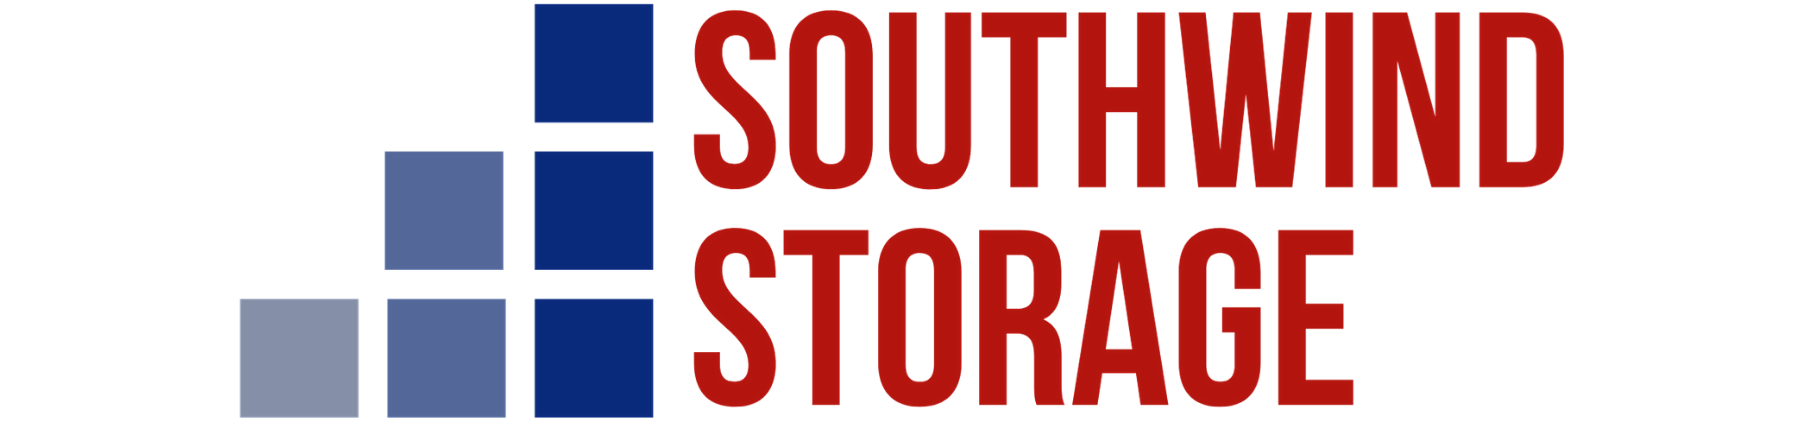 Southwind Storage